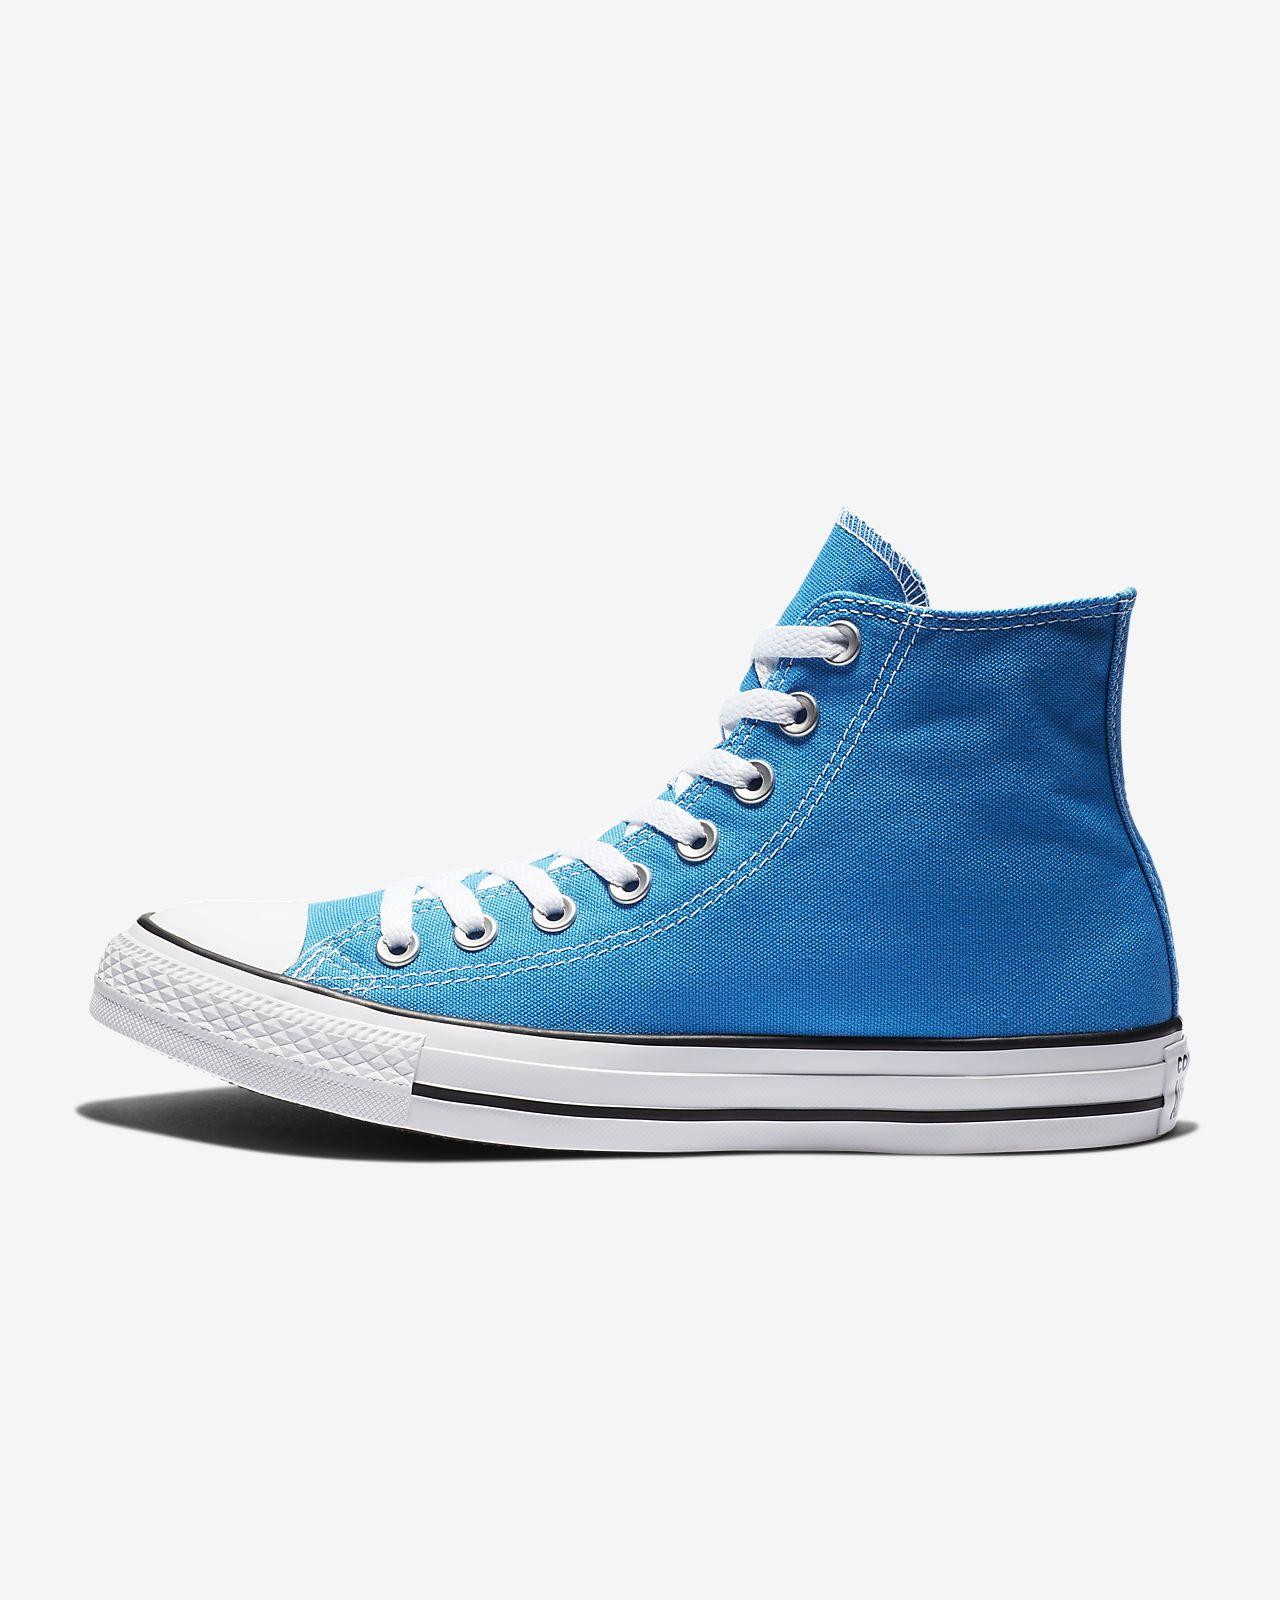 Converse Chuck Taylor All Star Seasonal Colors High Top Unisex Shoe